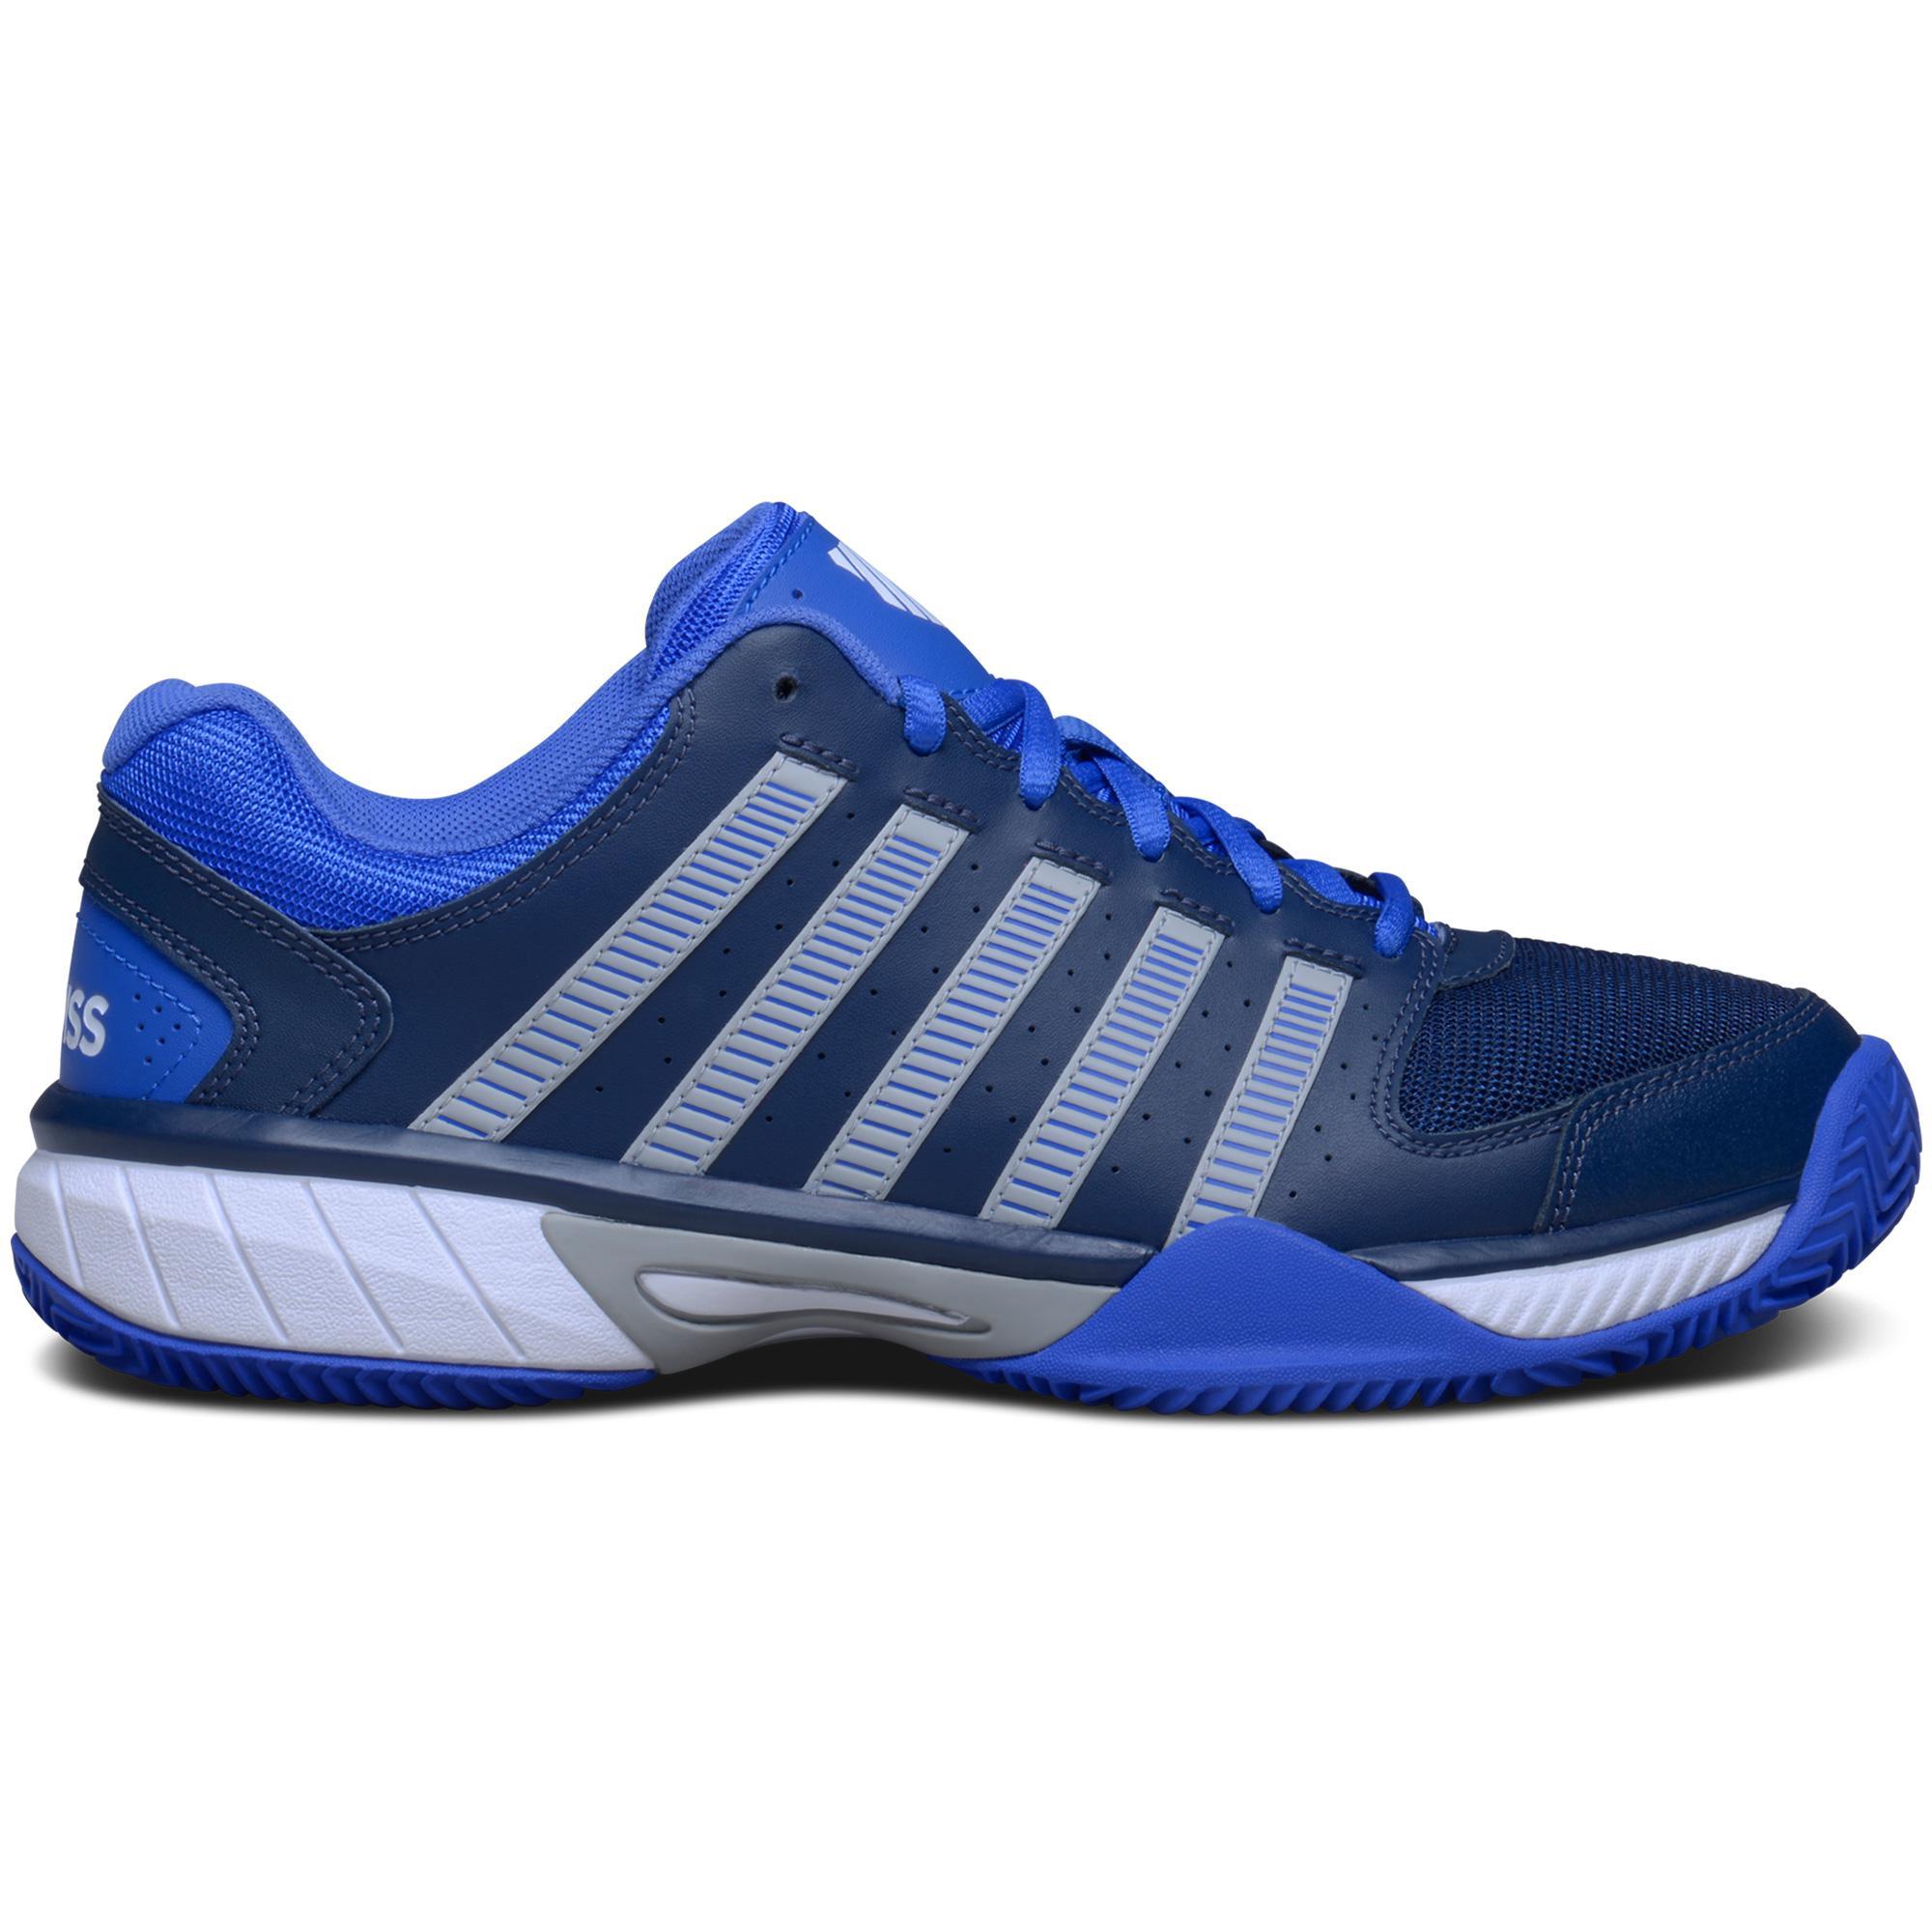 K-Swiss Mens Express LTR Tennis Shoes - Blue - Tennisnuts.com